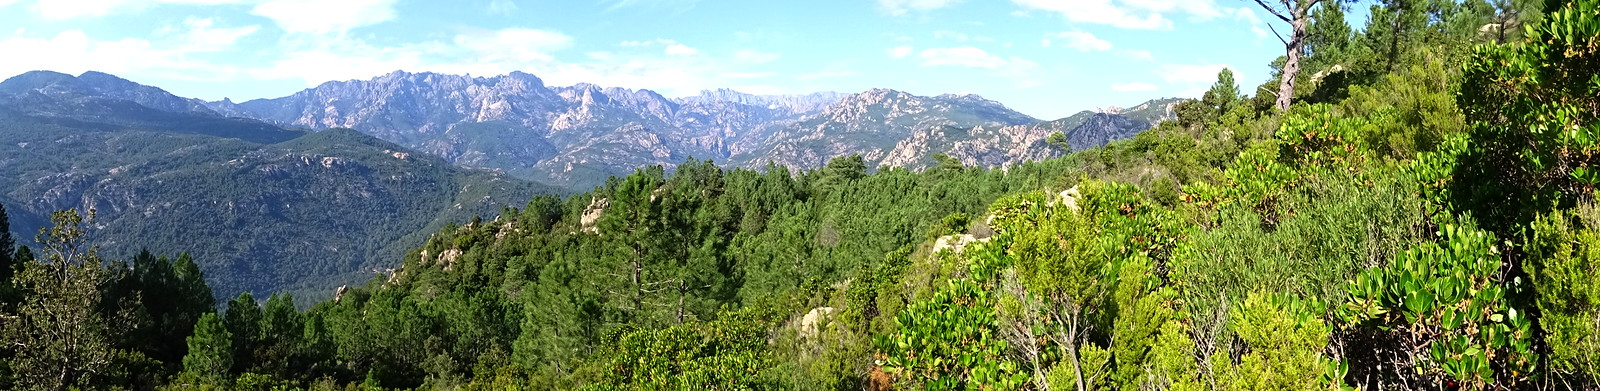 Panoramique crêtes de Bavedda depuis le sentier de Conca